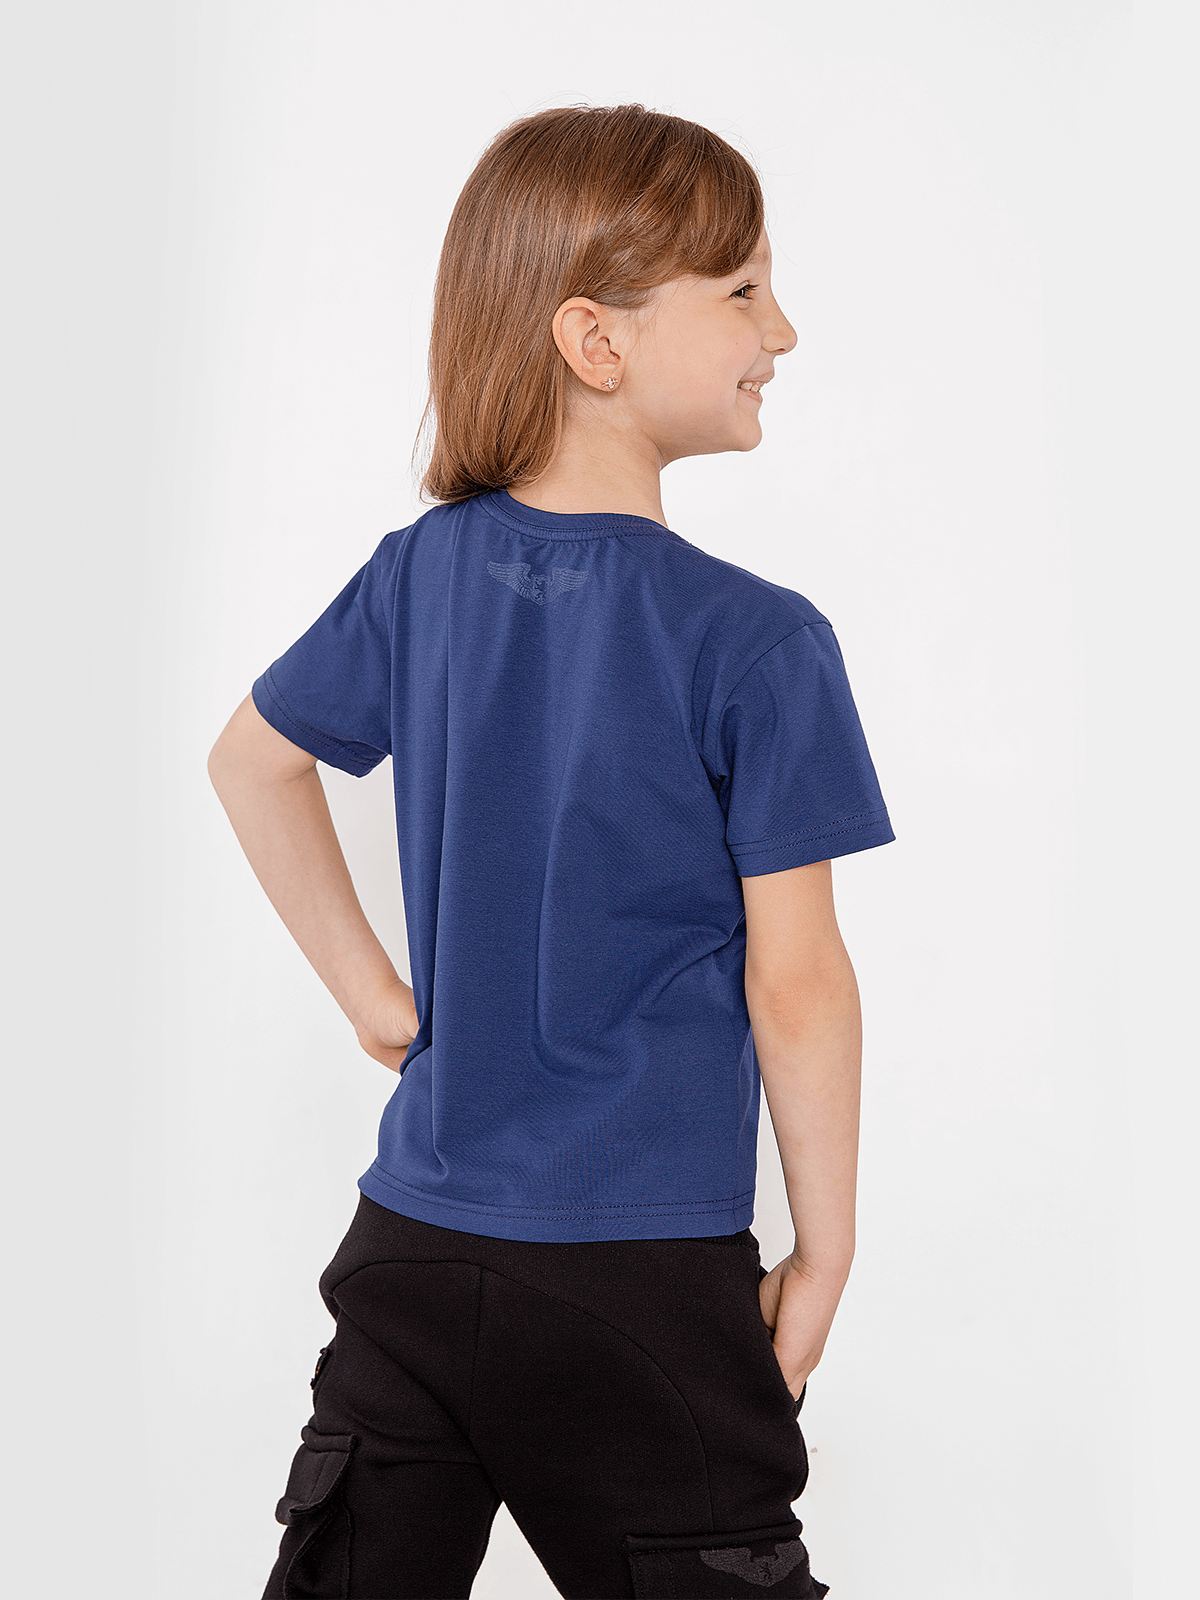 Kids T-Shirt Bee. Color navy blue. 3.